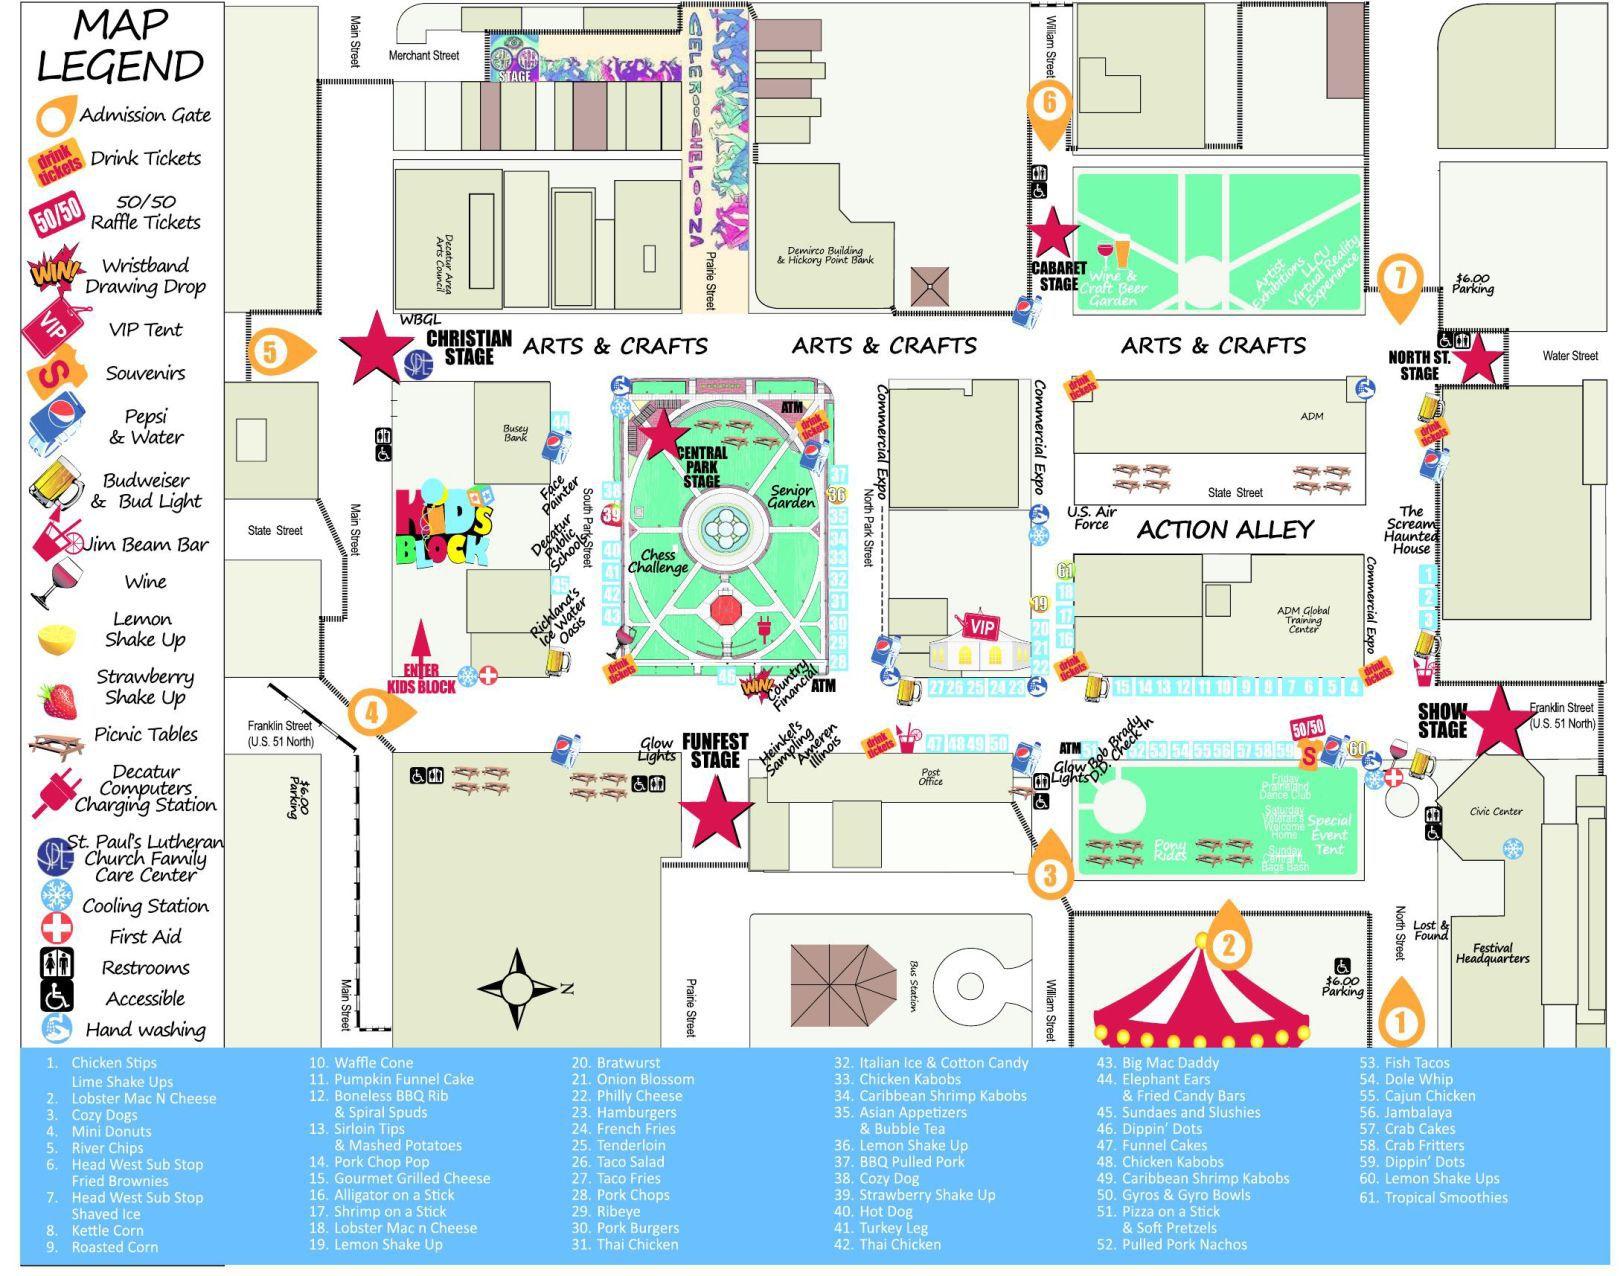 Decatur Celebration 2017 map heraldreviewcom